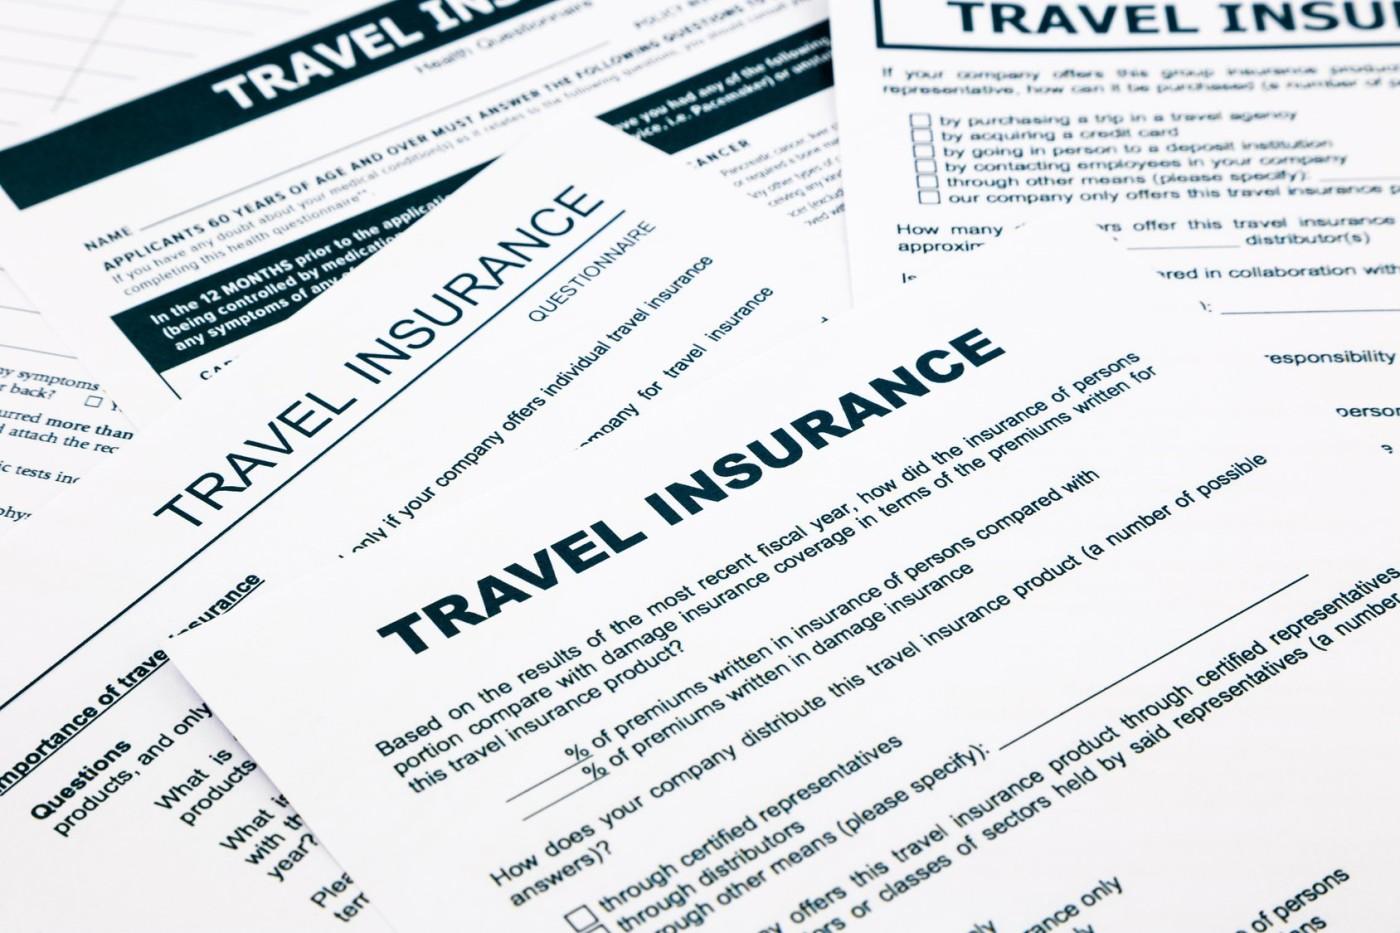 Air Care Travel Insurance